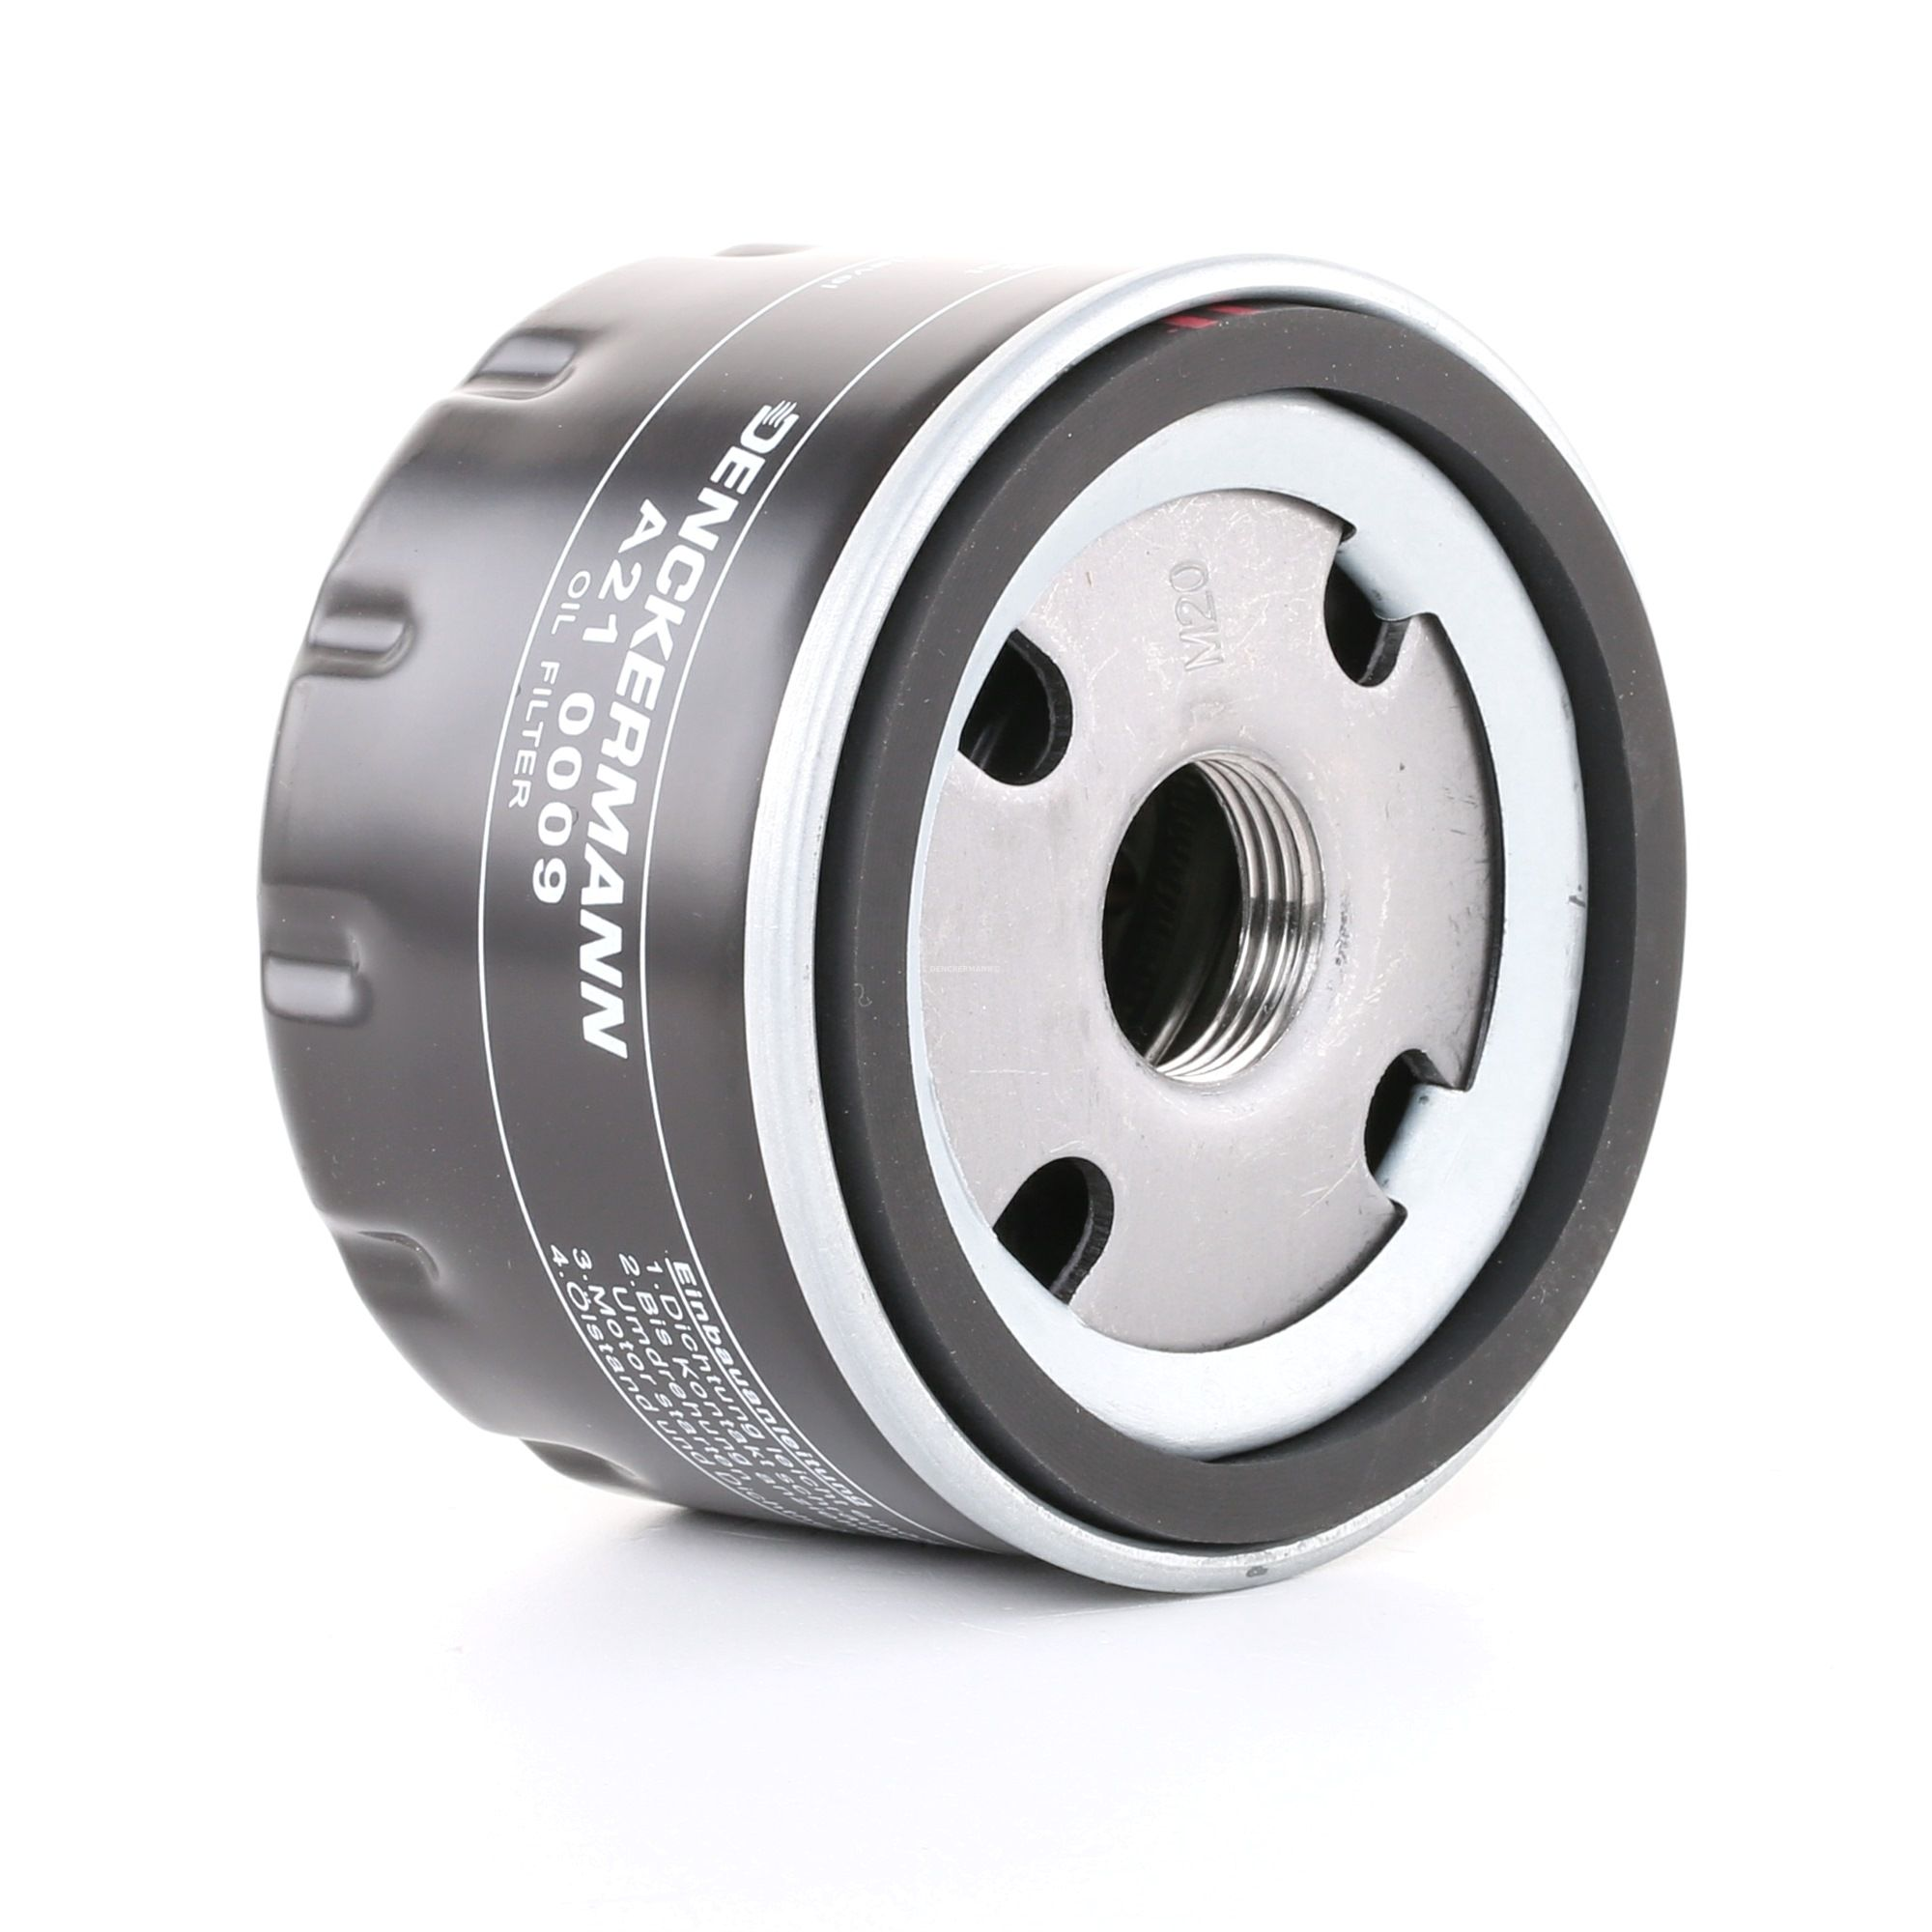 A210009 DENCKERMANN Inner Diameter 2: 72mm, Inner Diameter 2: 63mm, Height: 53mm Oil Filter A210009 cheap